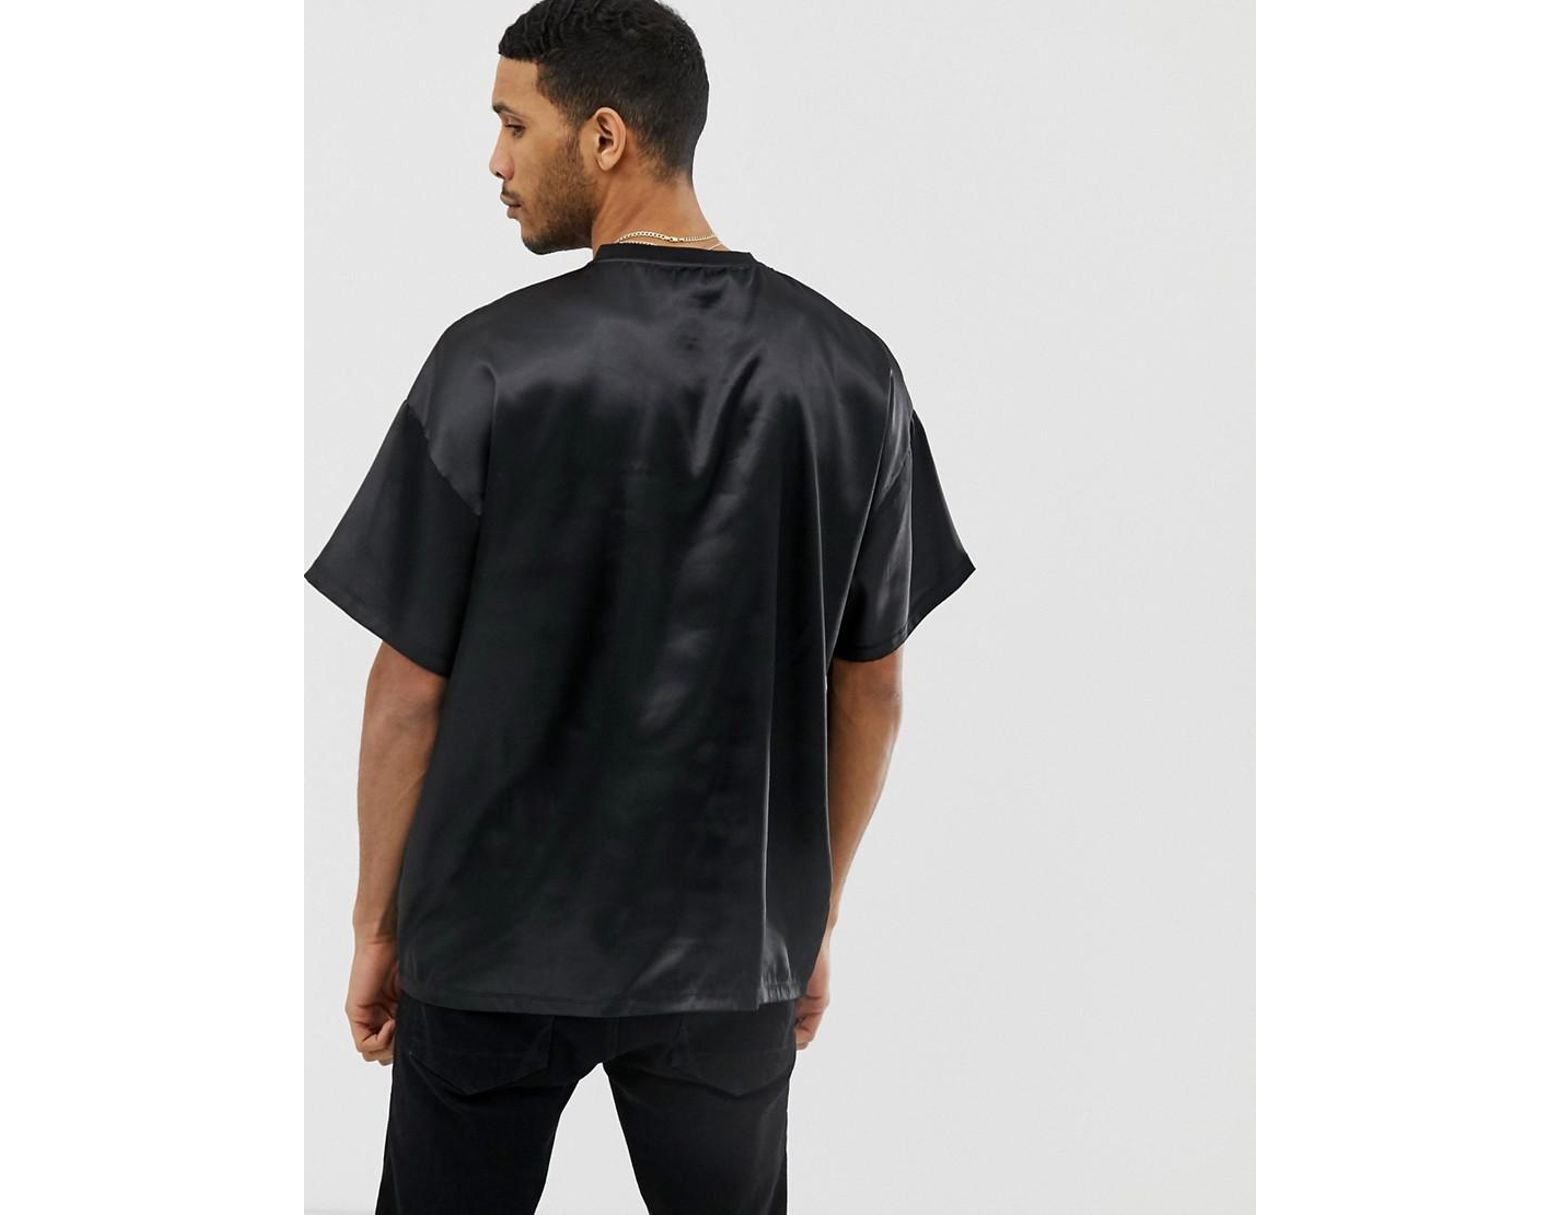 145c8652bf42 ASOS Oversized T-shirt In Satin Fabric In Black in Black for Men - Lyst